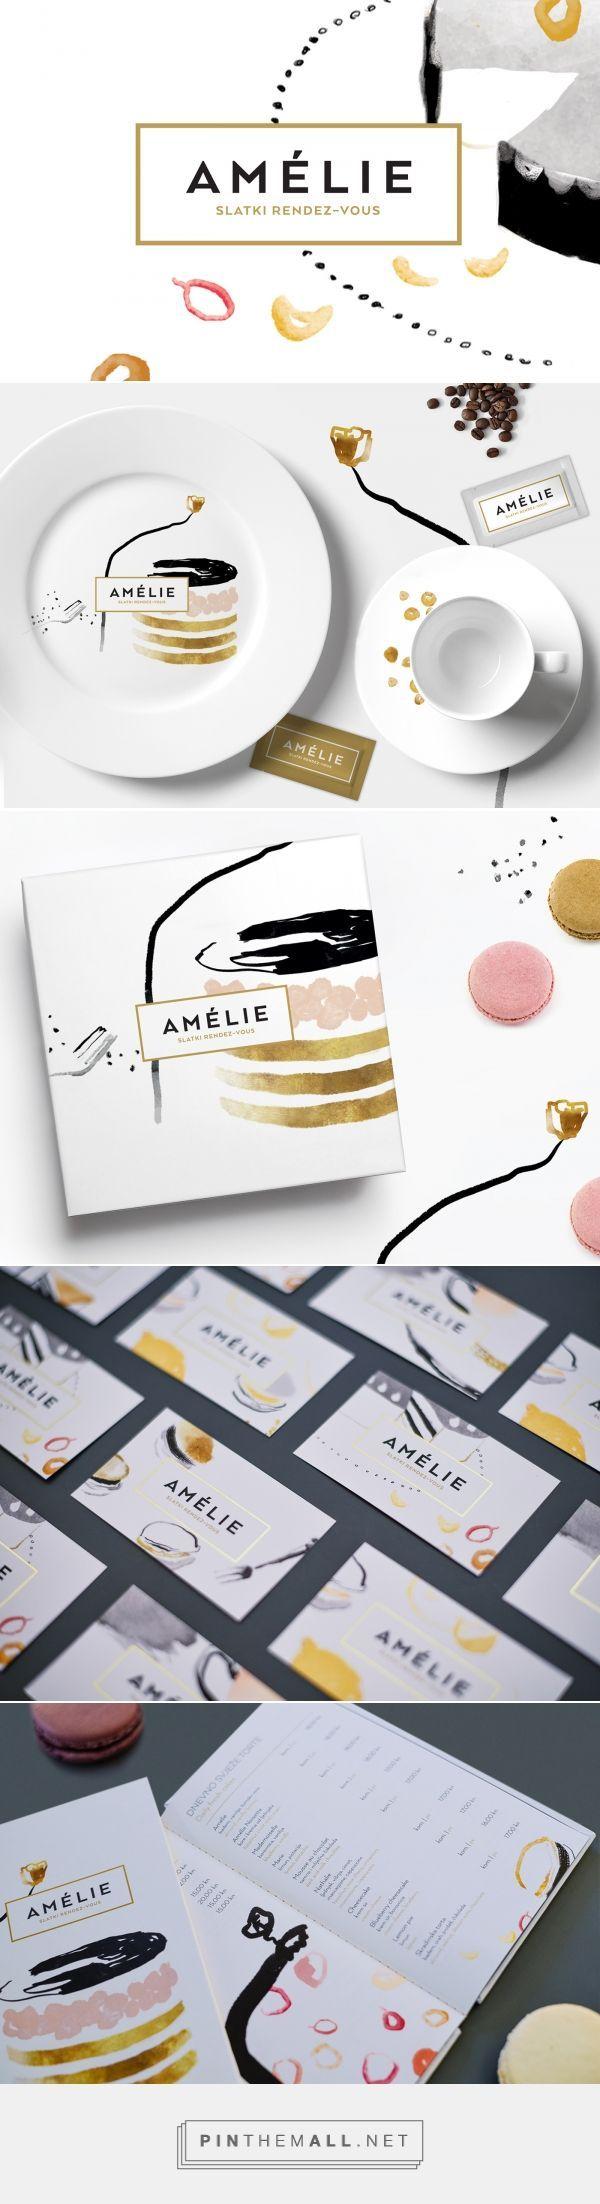 Amélie identity on Behance | Fivestar Branding – Design and Branding Agency & Inspiration Gallery